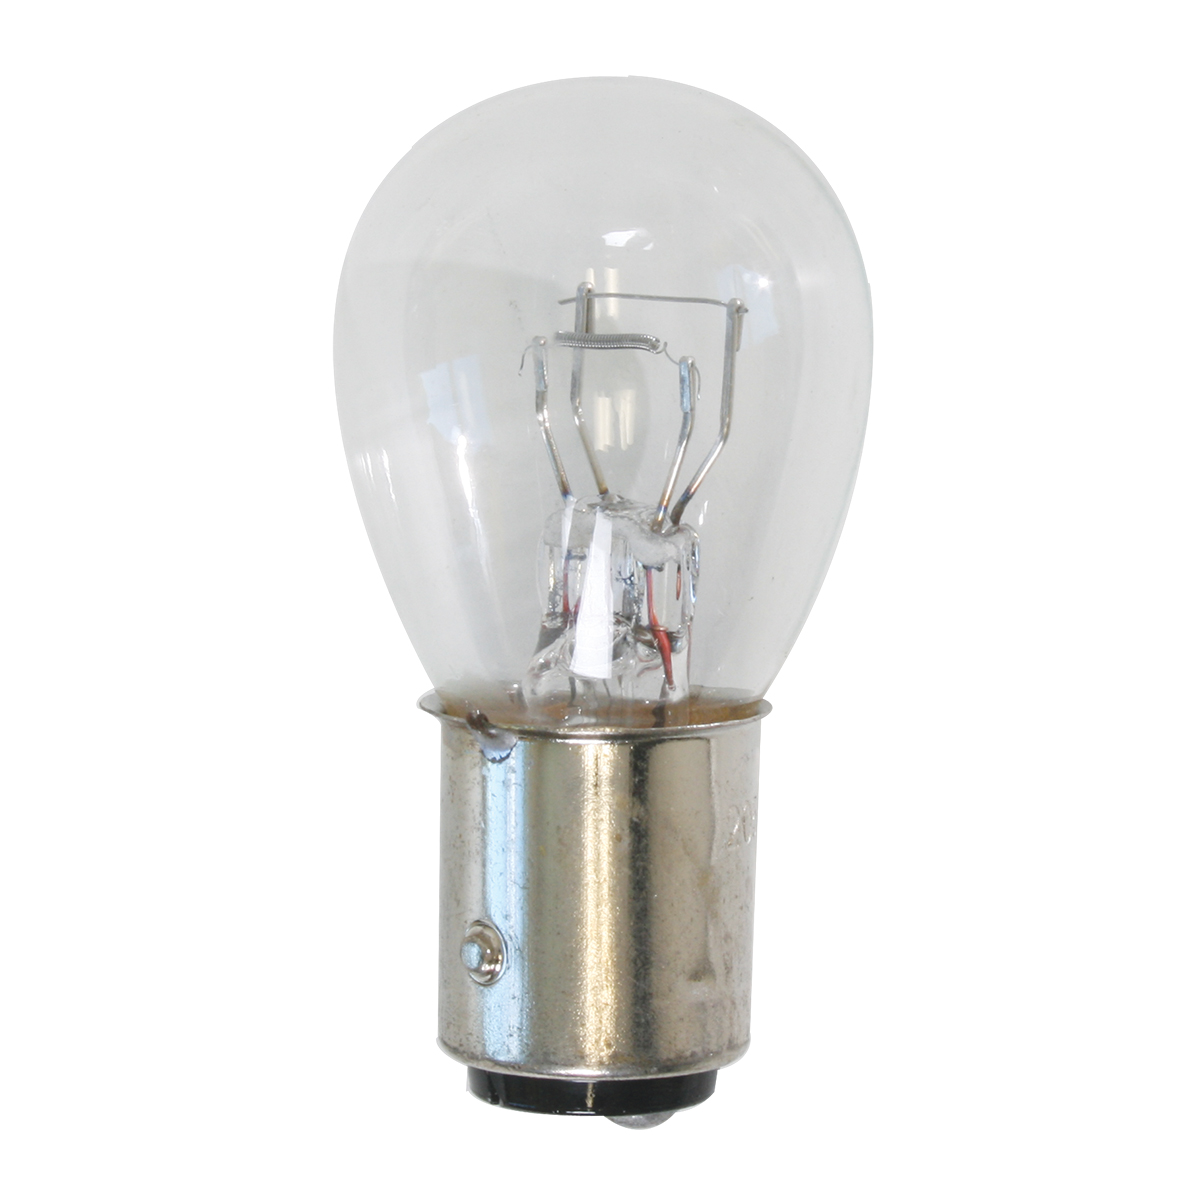 Trailer Light Bulb Replacement